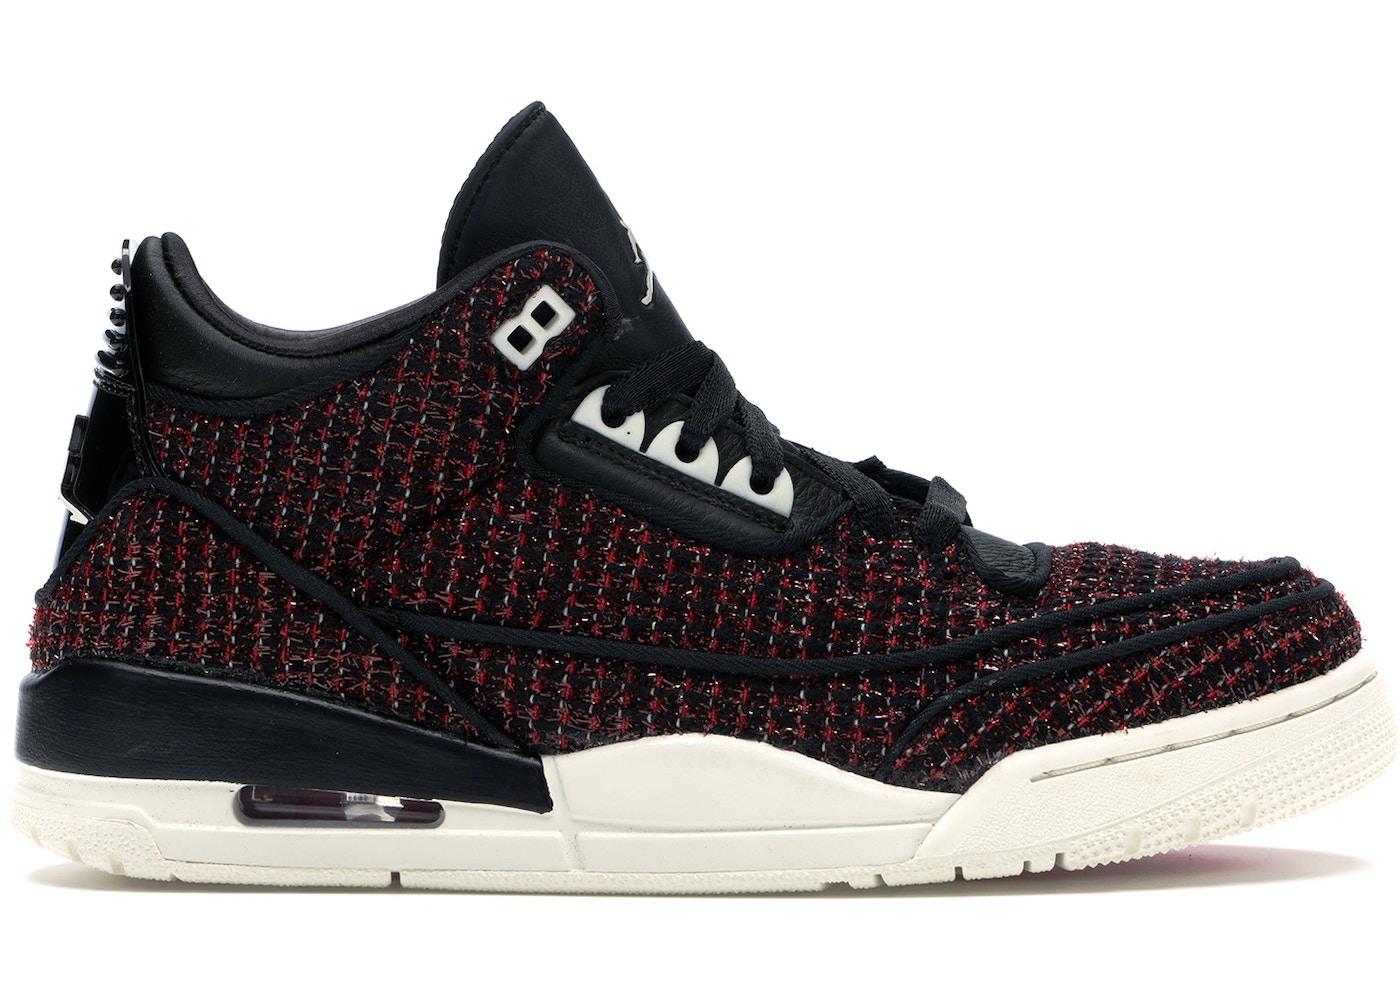 3d4d763230854f Air Jordan 3 Shoes - Release Date